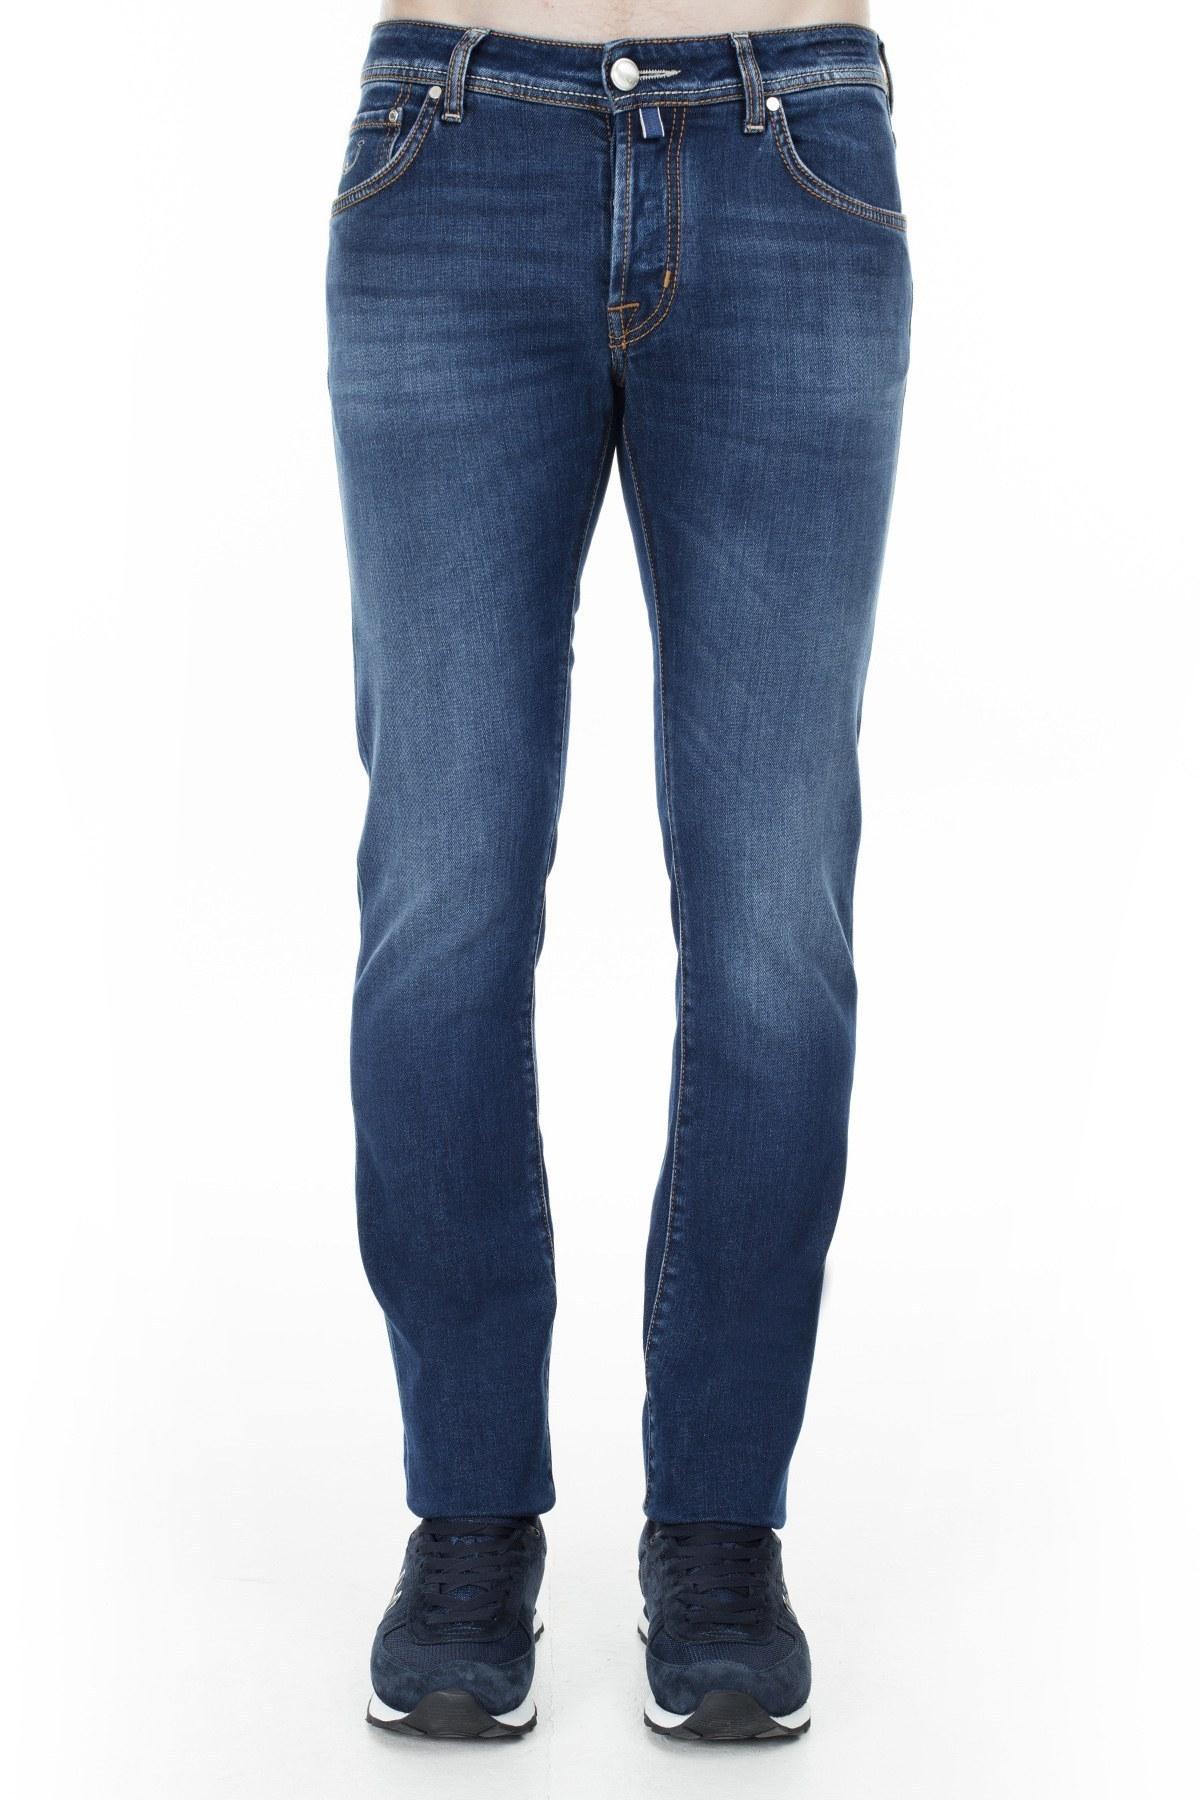 Jacob Cohen Jeans Erkek Kot Pantolon J622 01572W2 5201C 002 LACİVERT